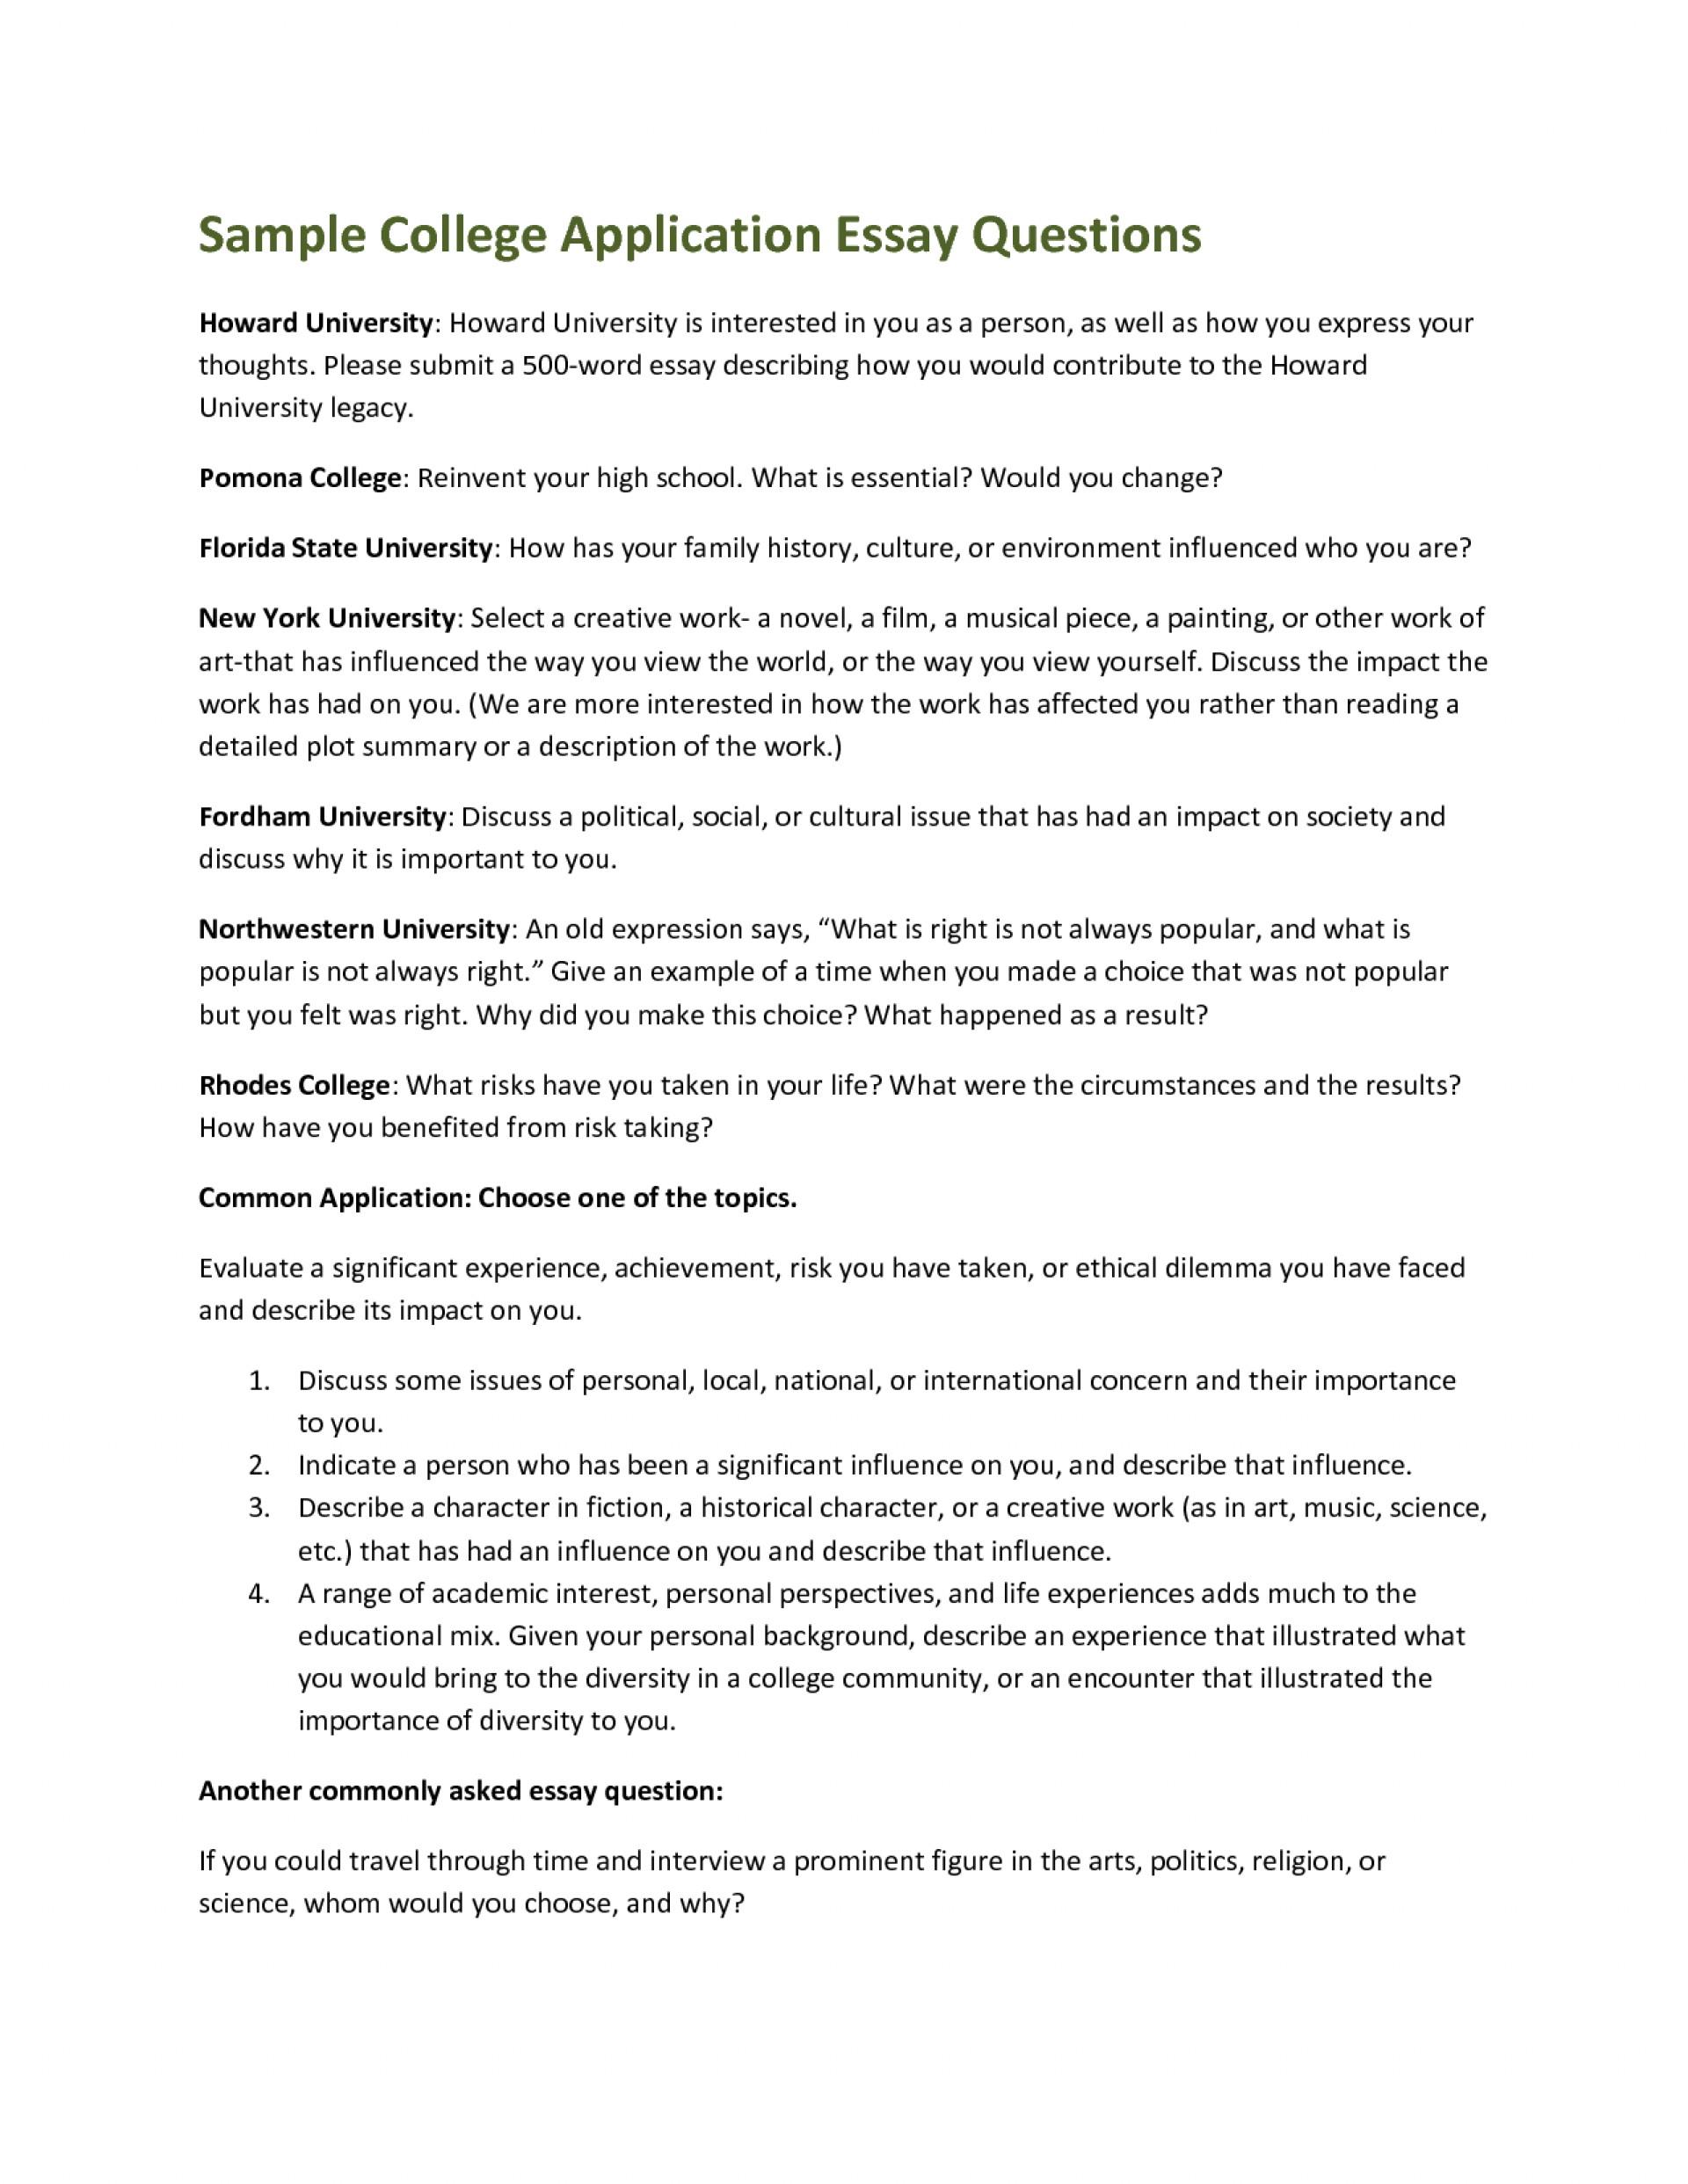 013 Nhs Application Essay Mctnczi8lc Top Conclusion Stp Questions Prompt 1920